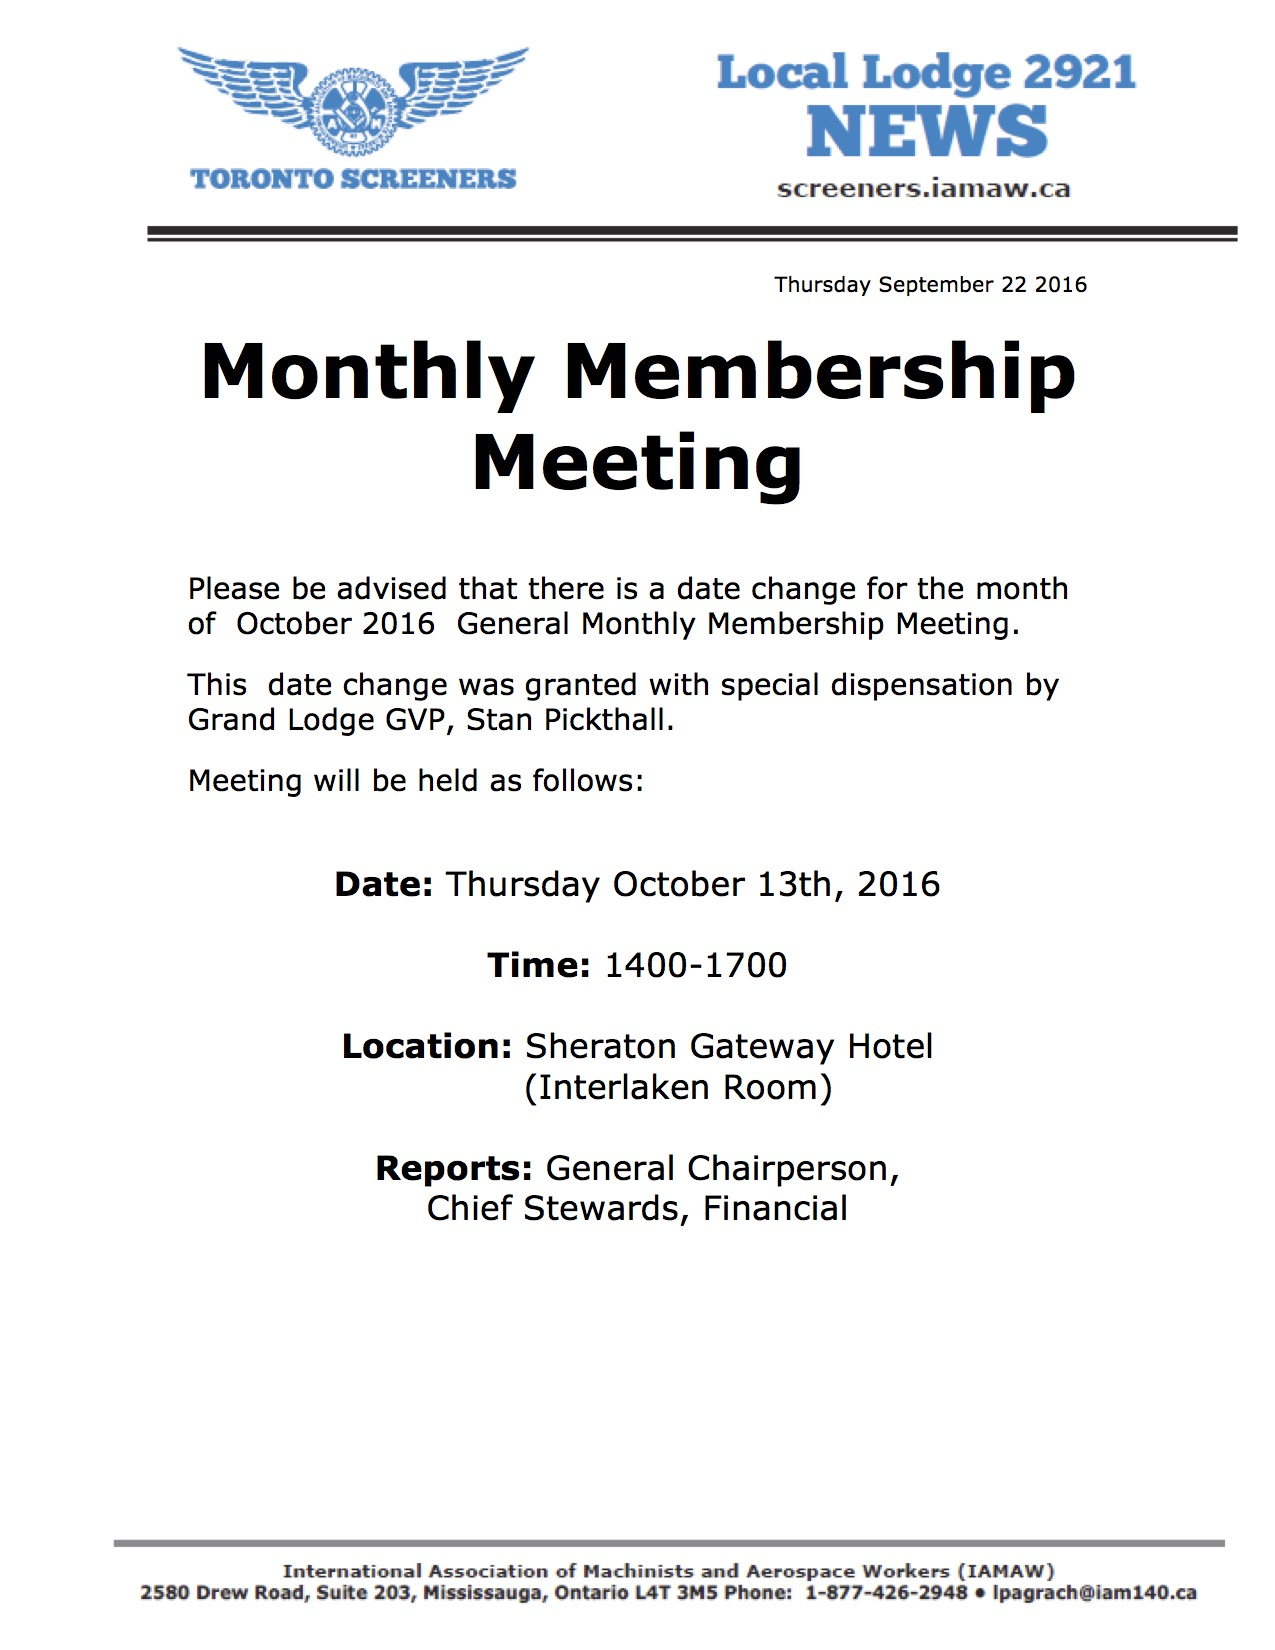 october-2016-monthly-membership-meeting